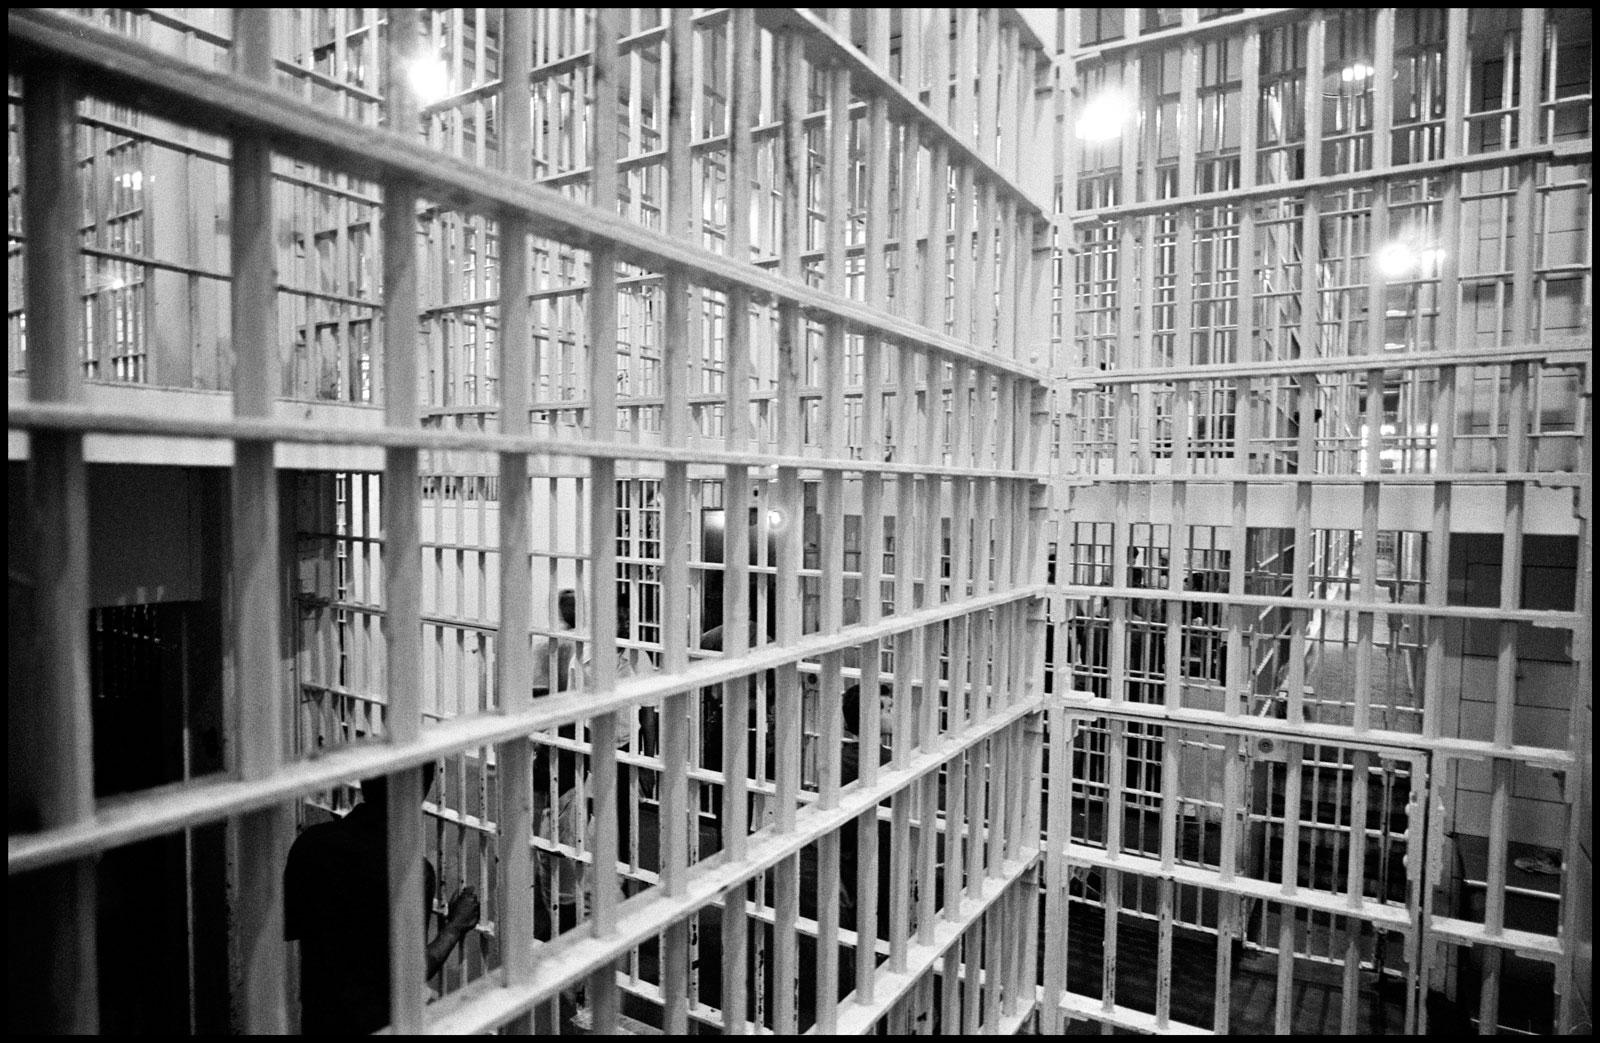 House of Detention, New York City, 1972